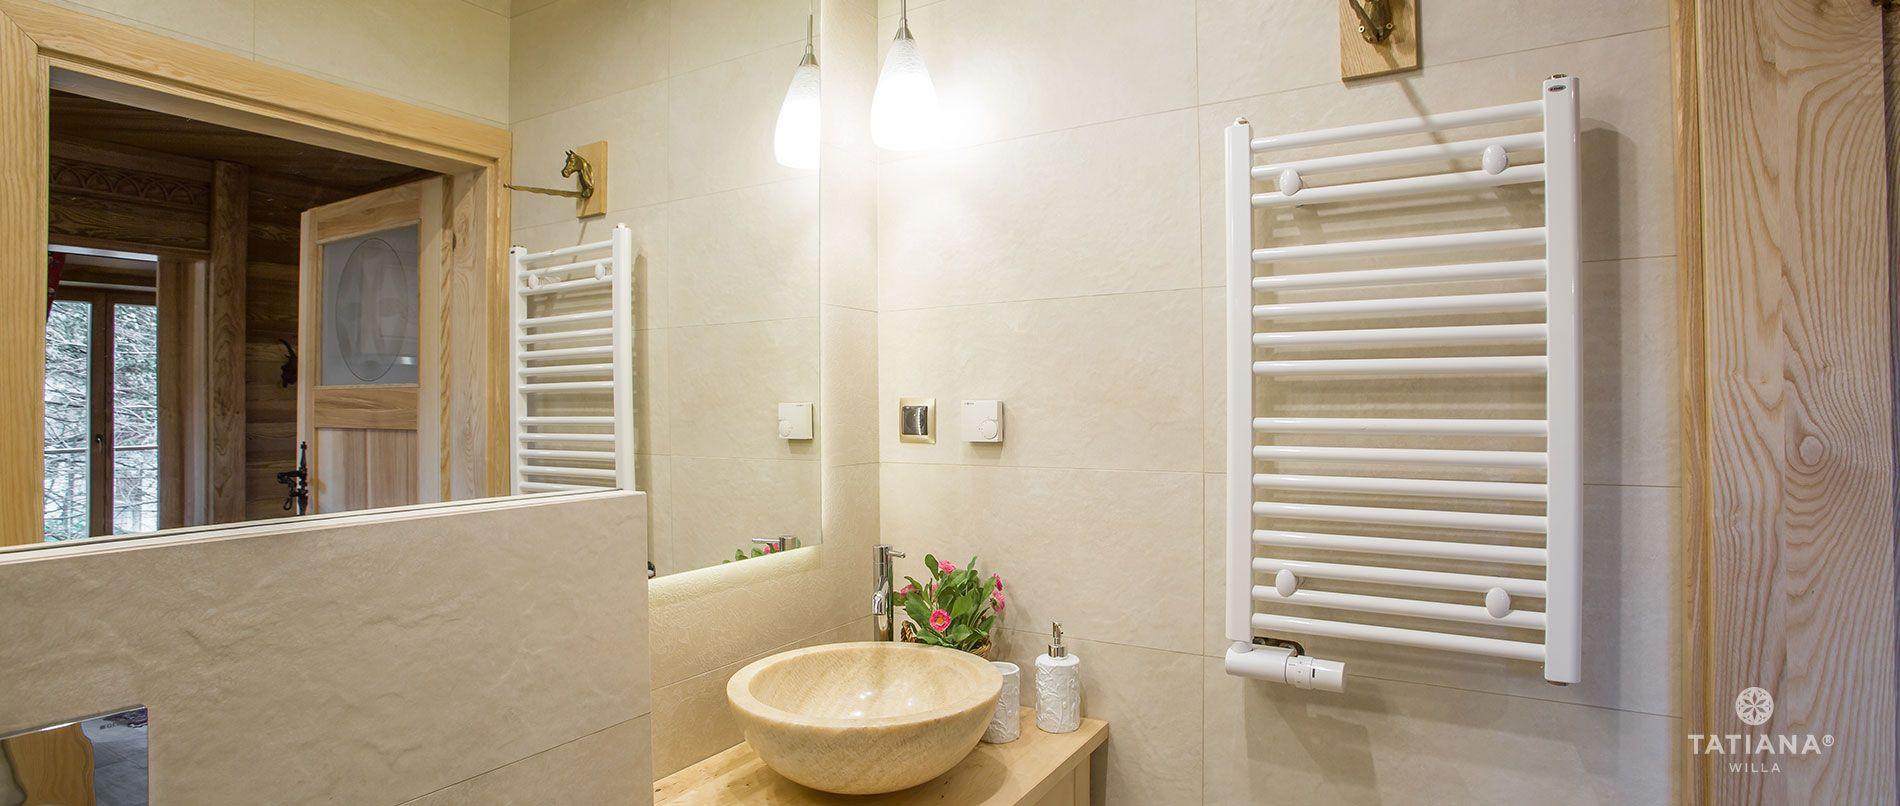 Apartament Tatrzański - łazienka